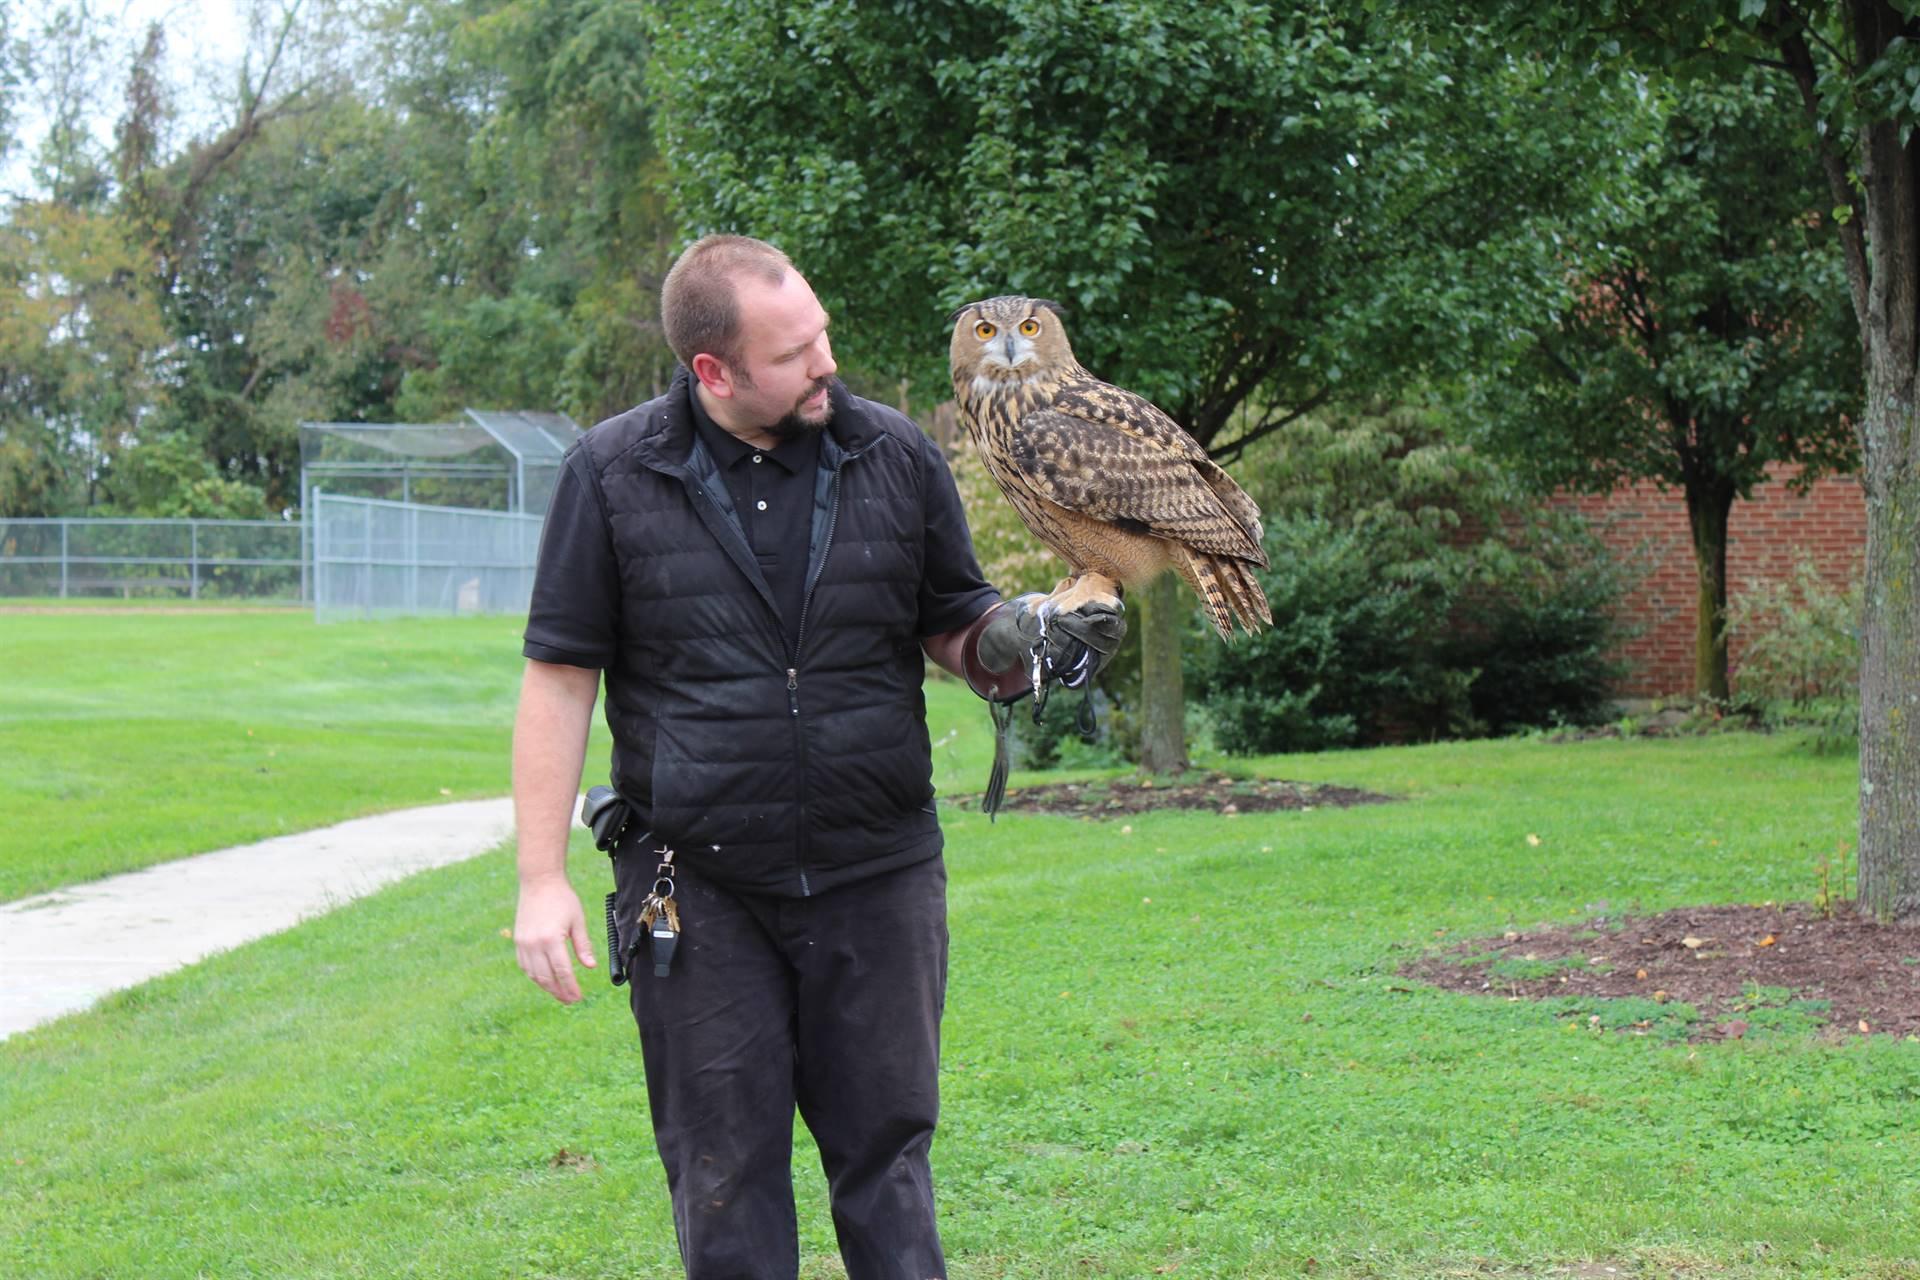 Mr. Davis holding the owl